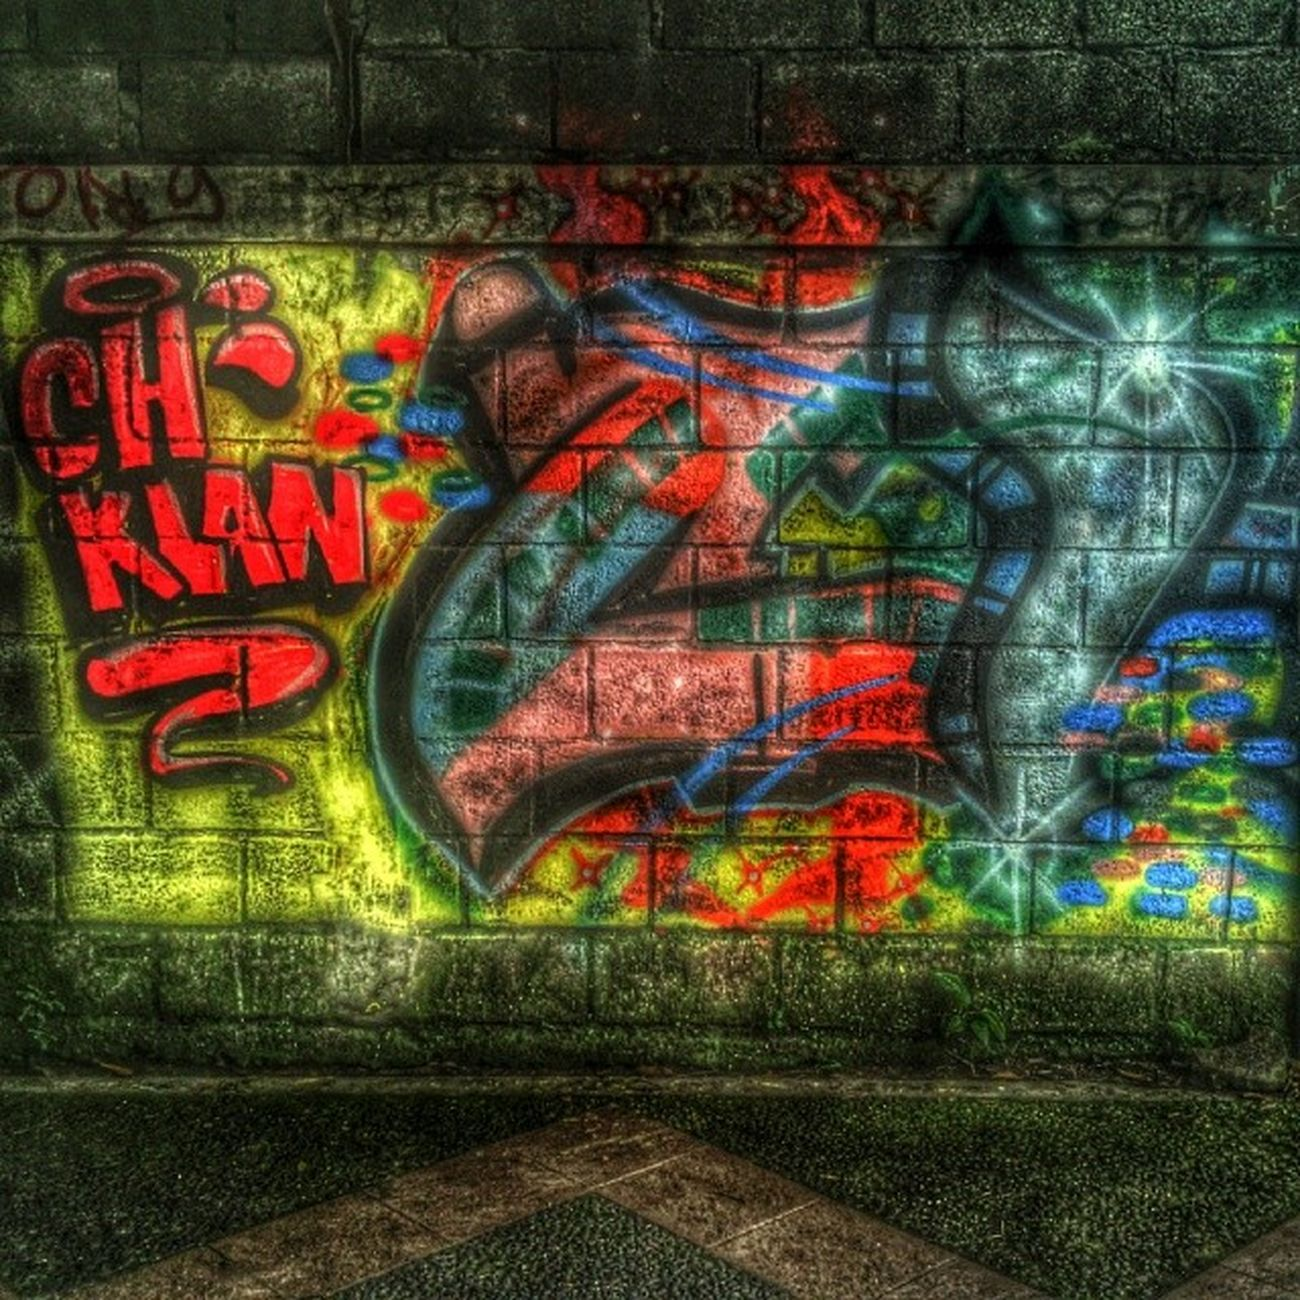 Streetphotography Wallporn Urbanwalls Urban urbanart instagraffiti instagrafite instagraff photooftheday artwork art sprayart streetphotography street streetartistry streetarteverywhere streetart fun follow graffitiporn gffeatured graffiti graffitiigers hdr likebackteam likealways like like4like likeback